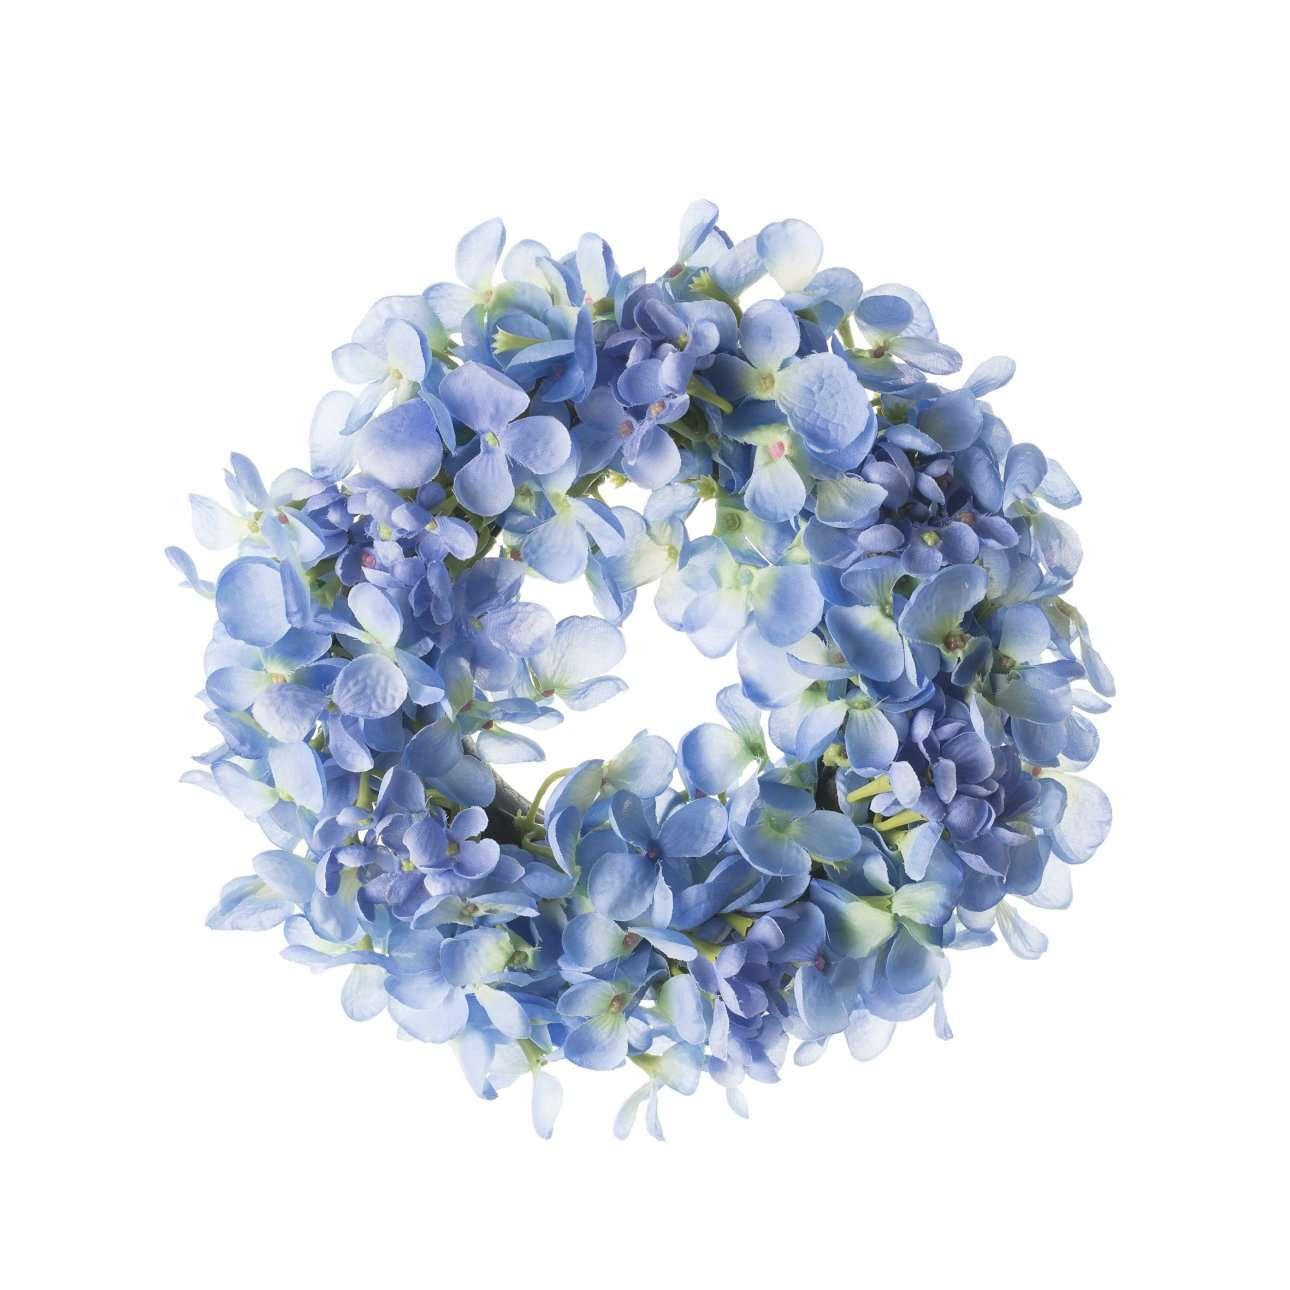 Blue Artificial Flower Wreath Dia 26 cm